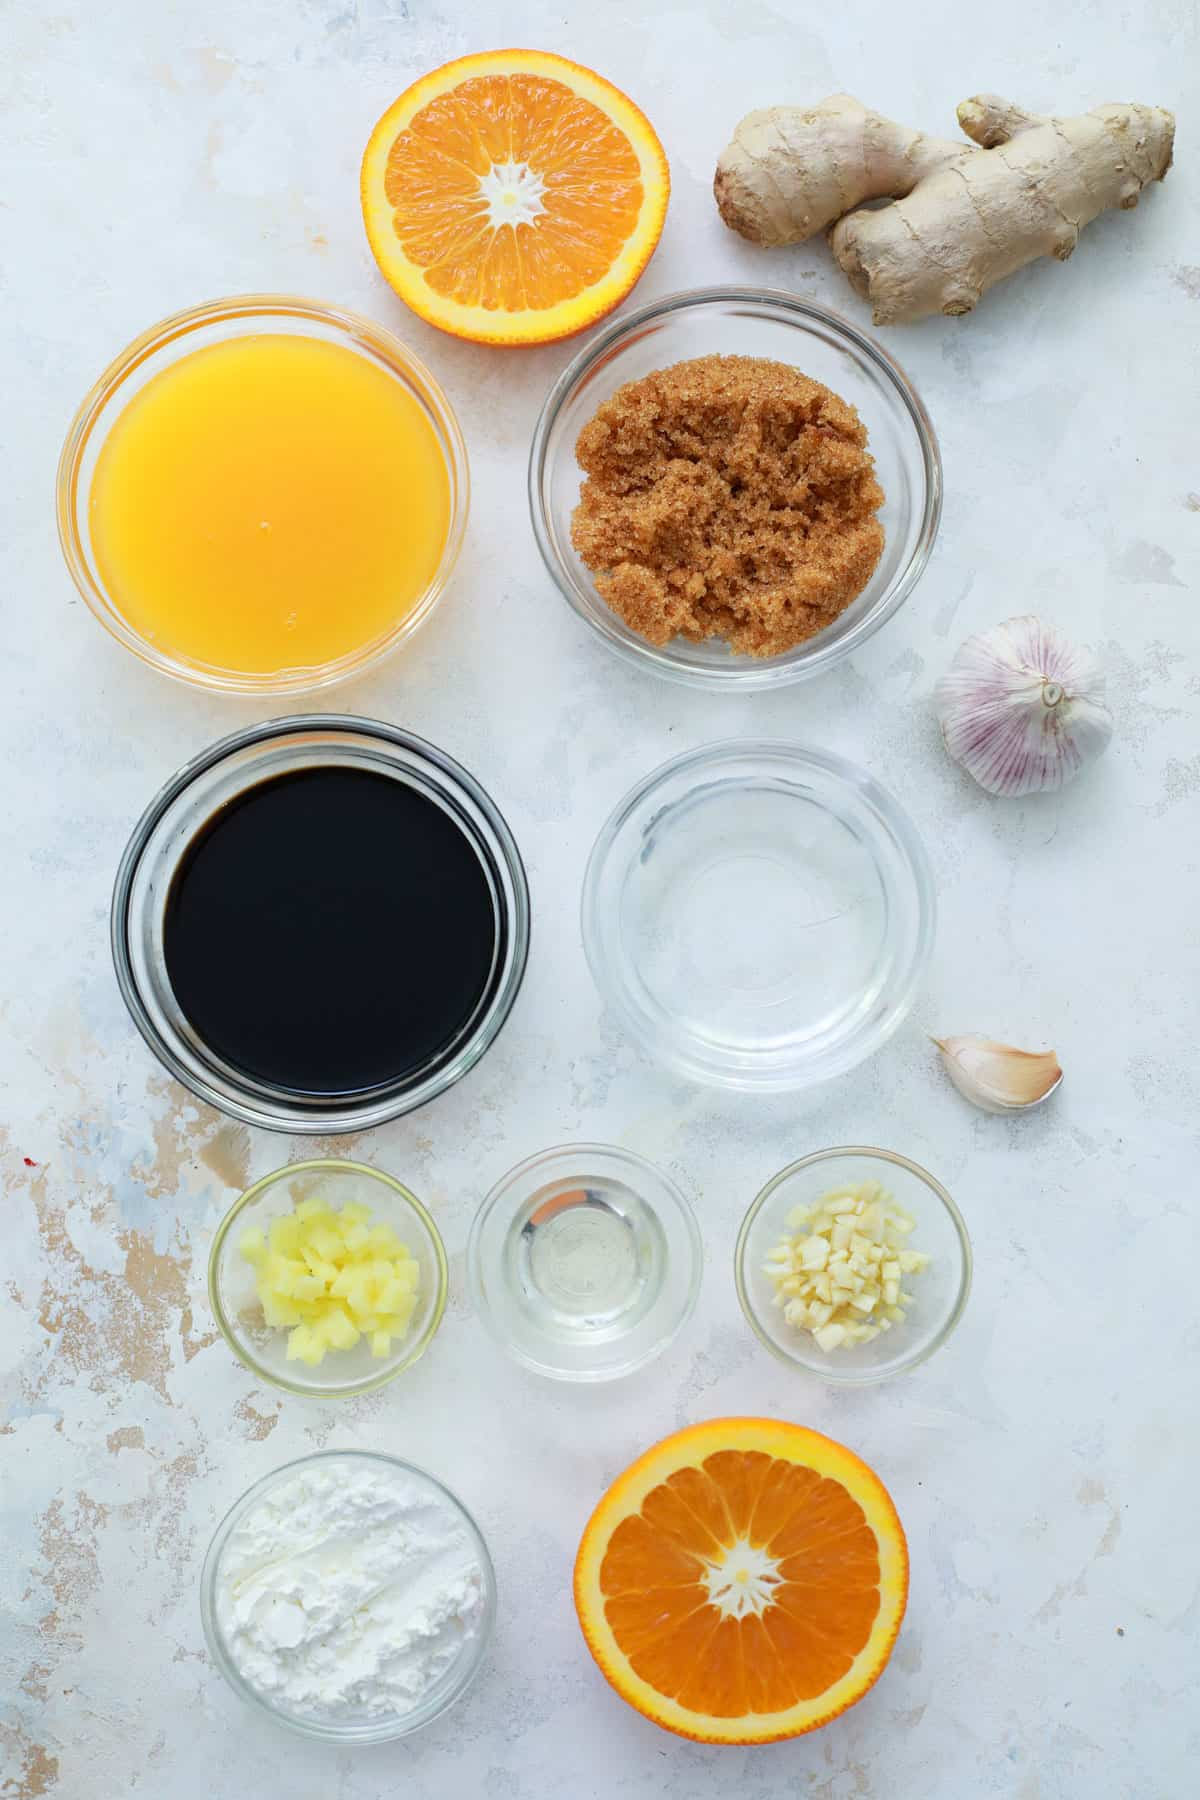 teriyaki sauce ingredients lined up together